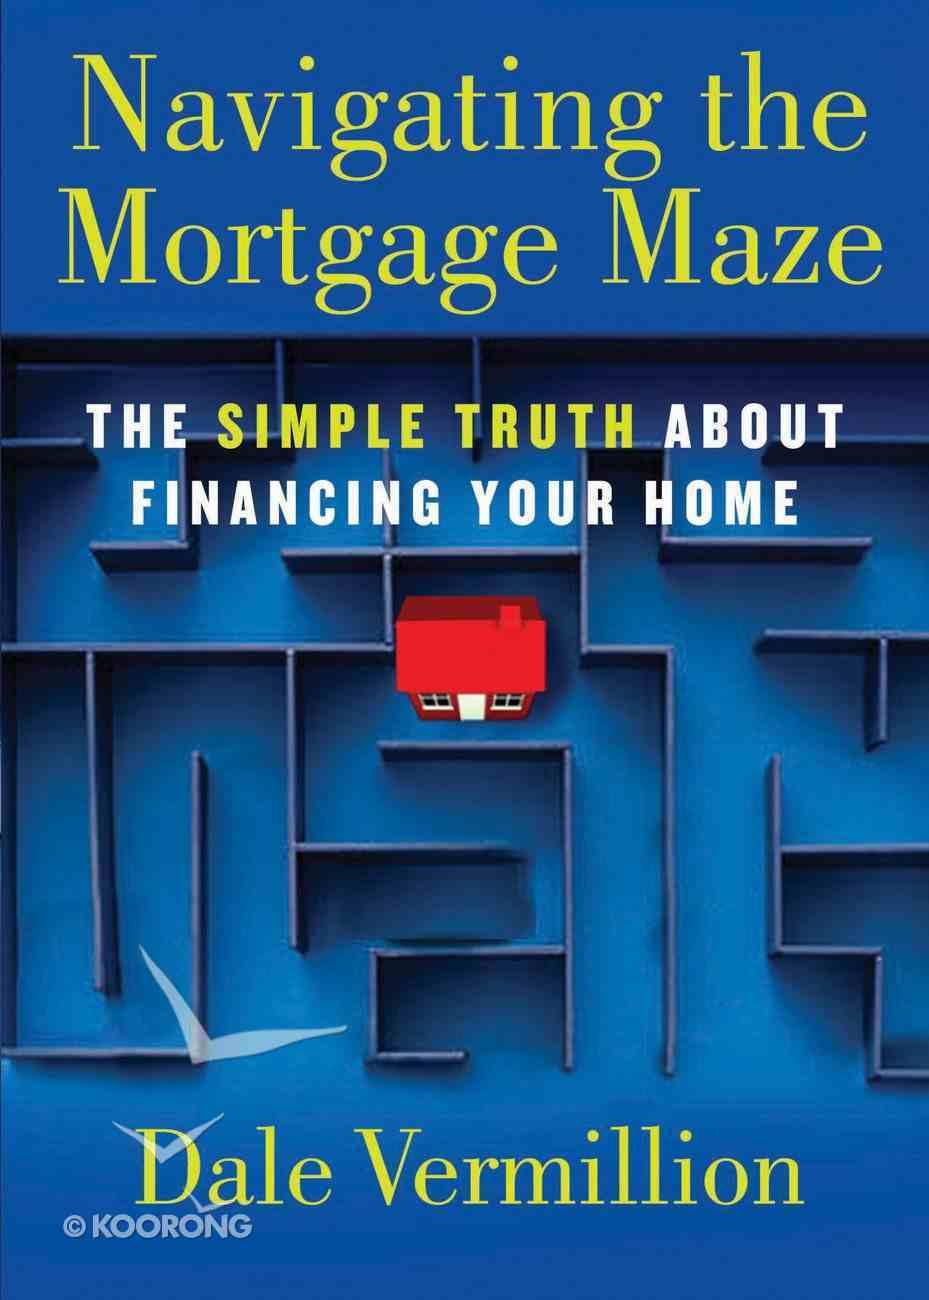 Navigating the Mortgage Maze Paperback